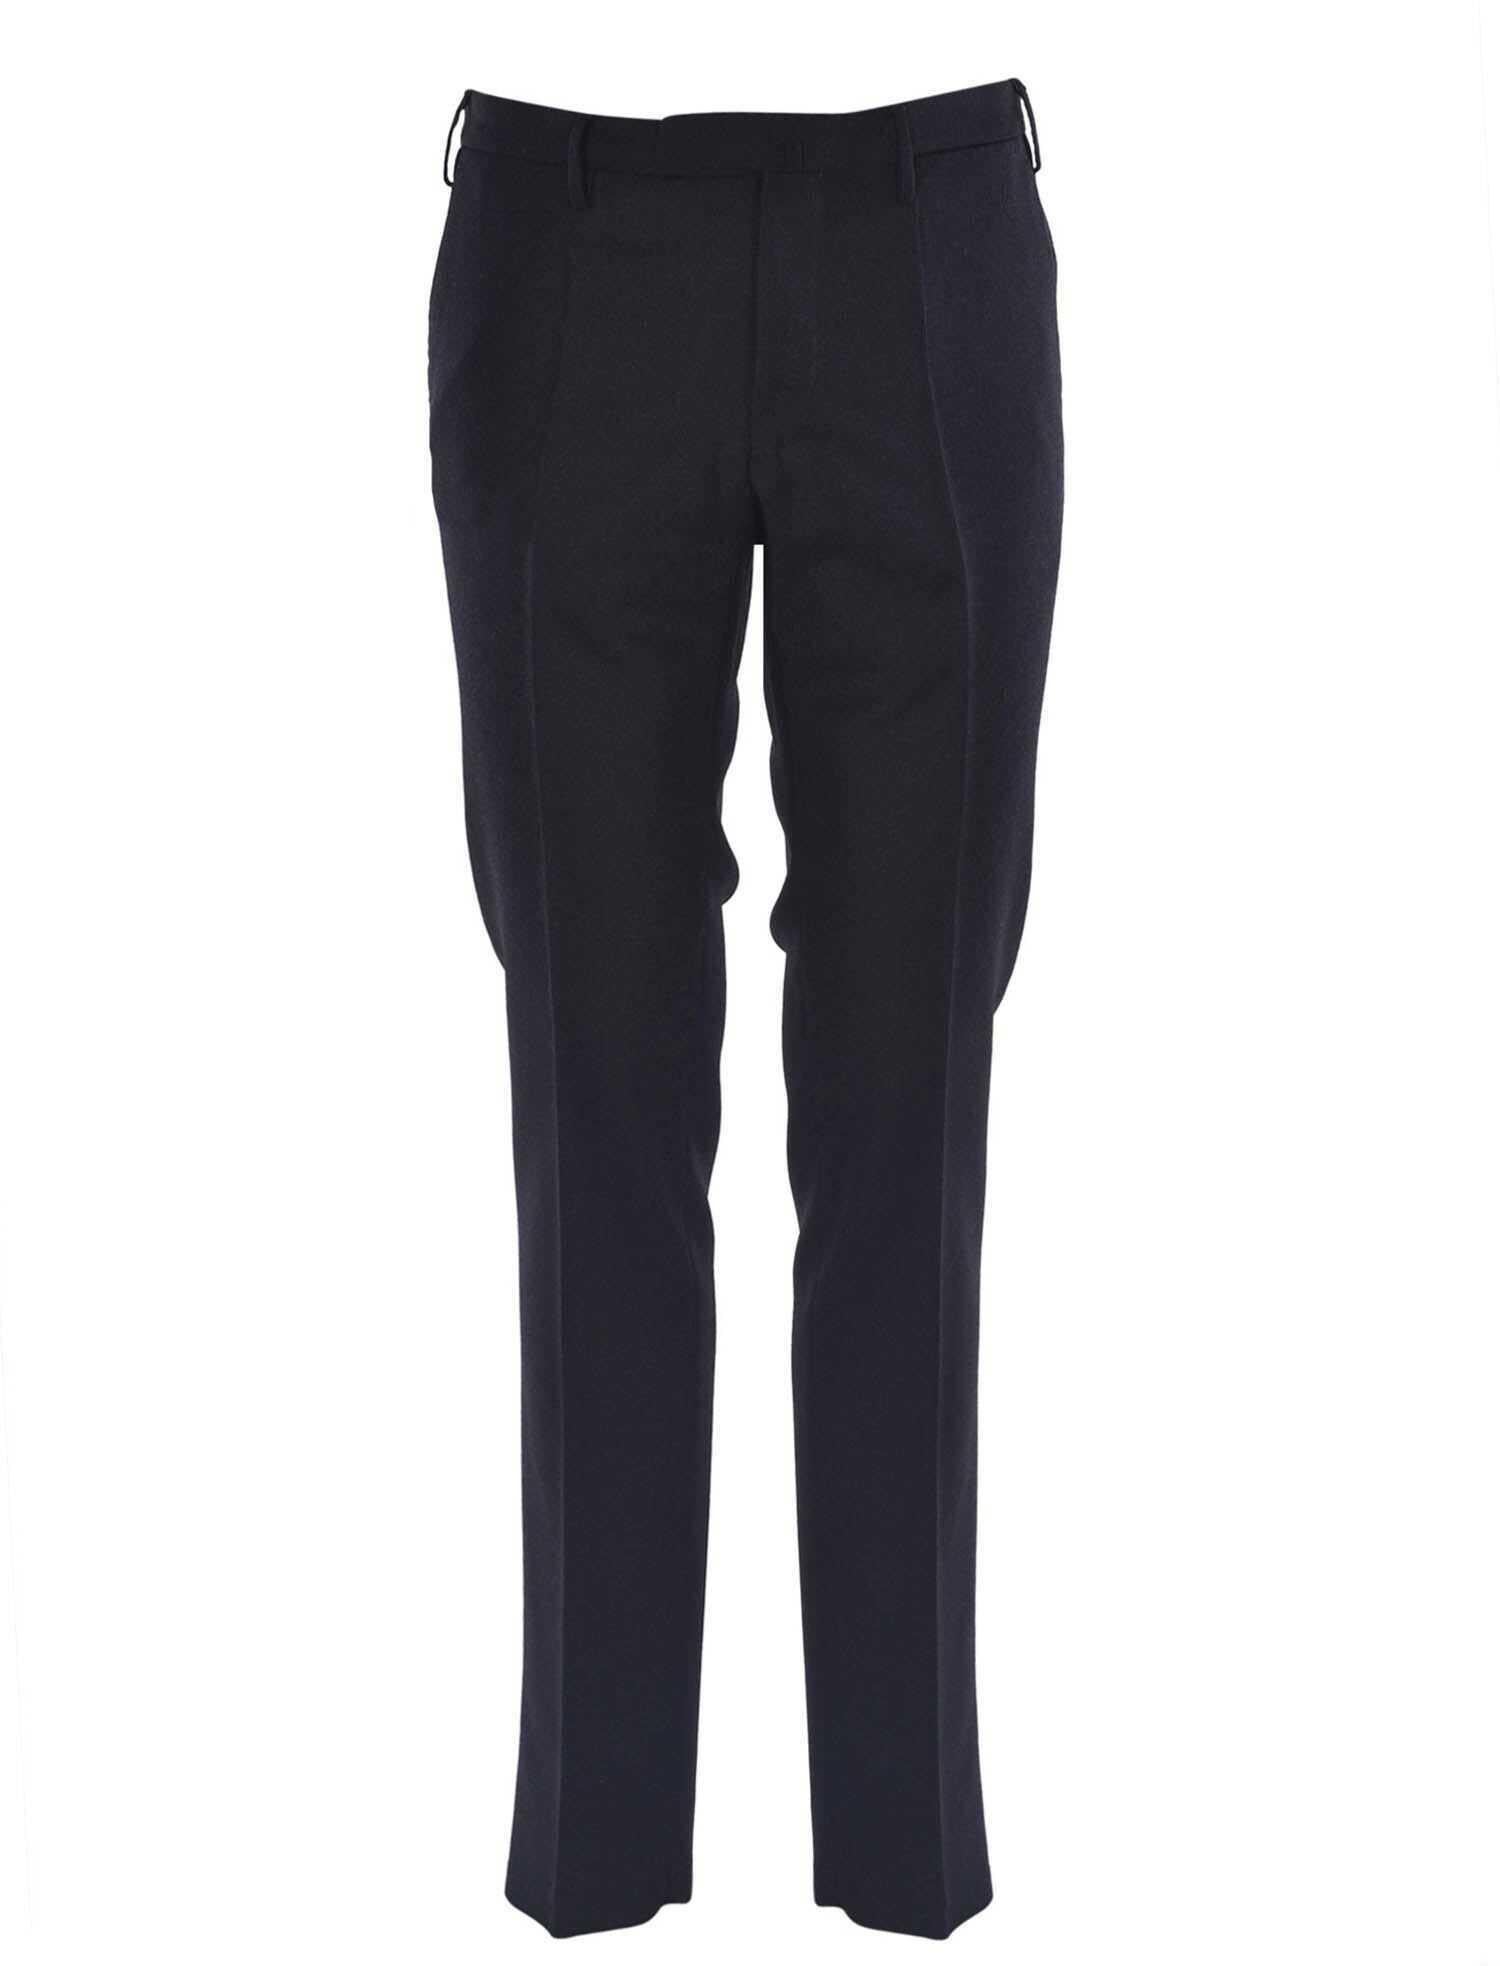 Incotex Slim Fit Partridge Eye Pants In Grey Grey imagine